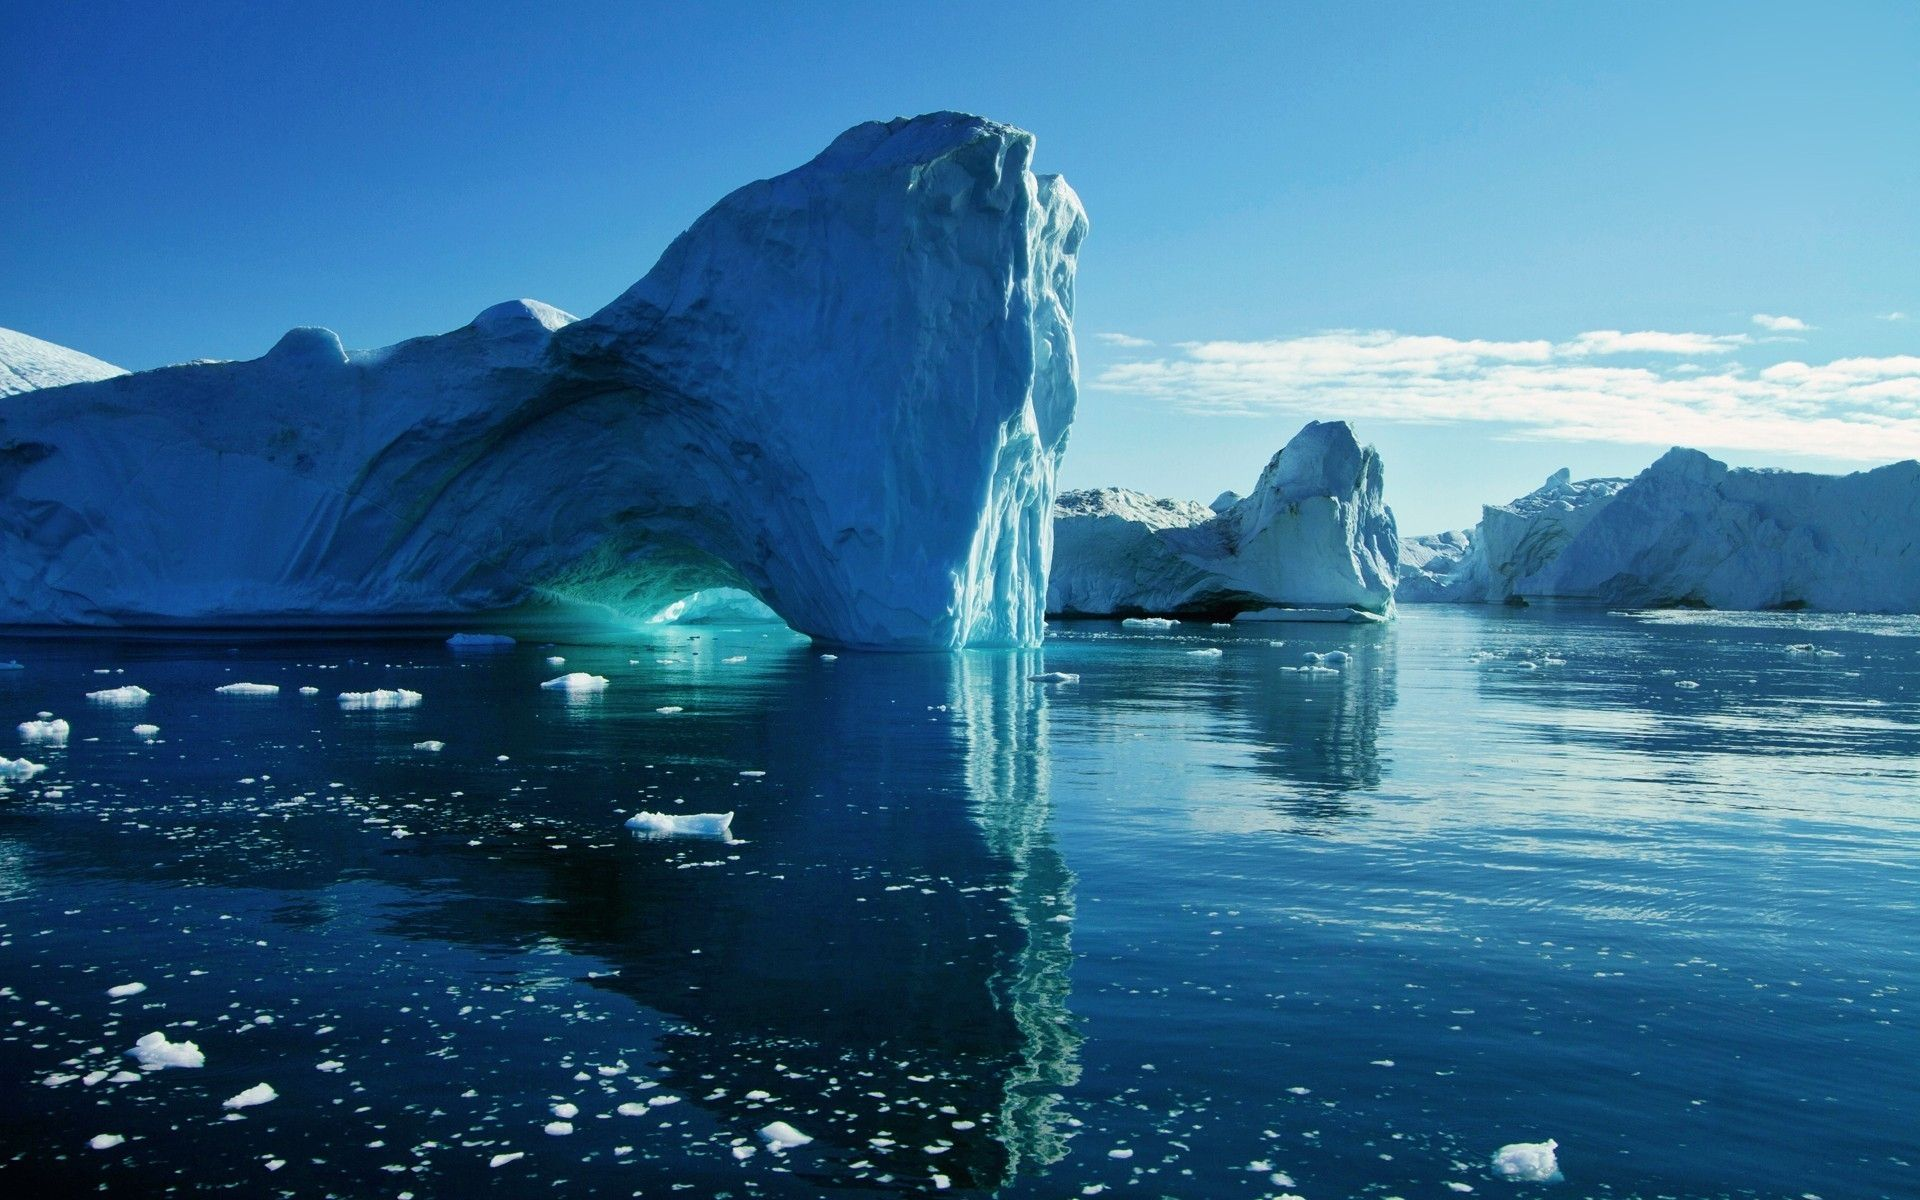 Melting Ice 1080p HD Wallpaper Nature